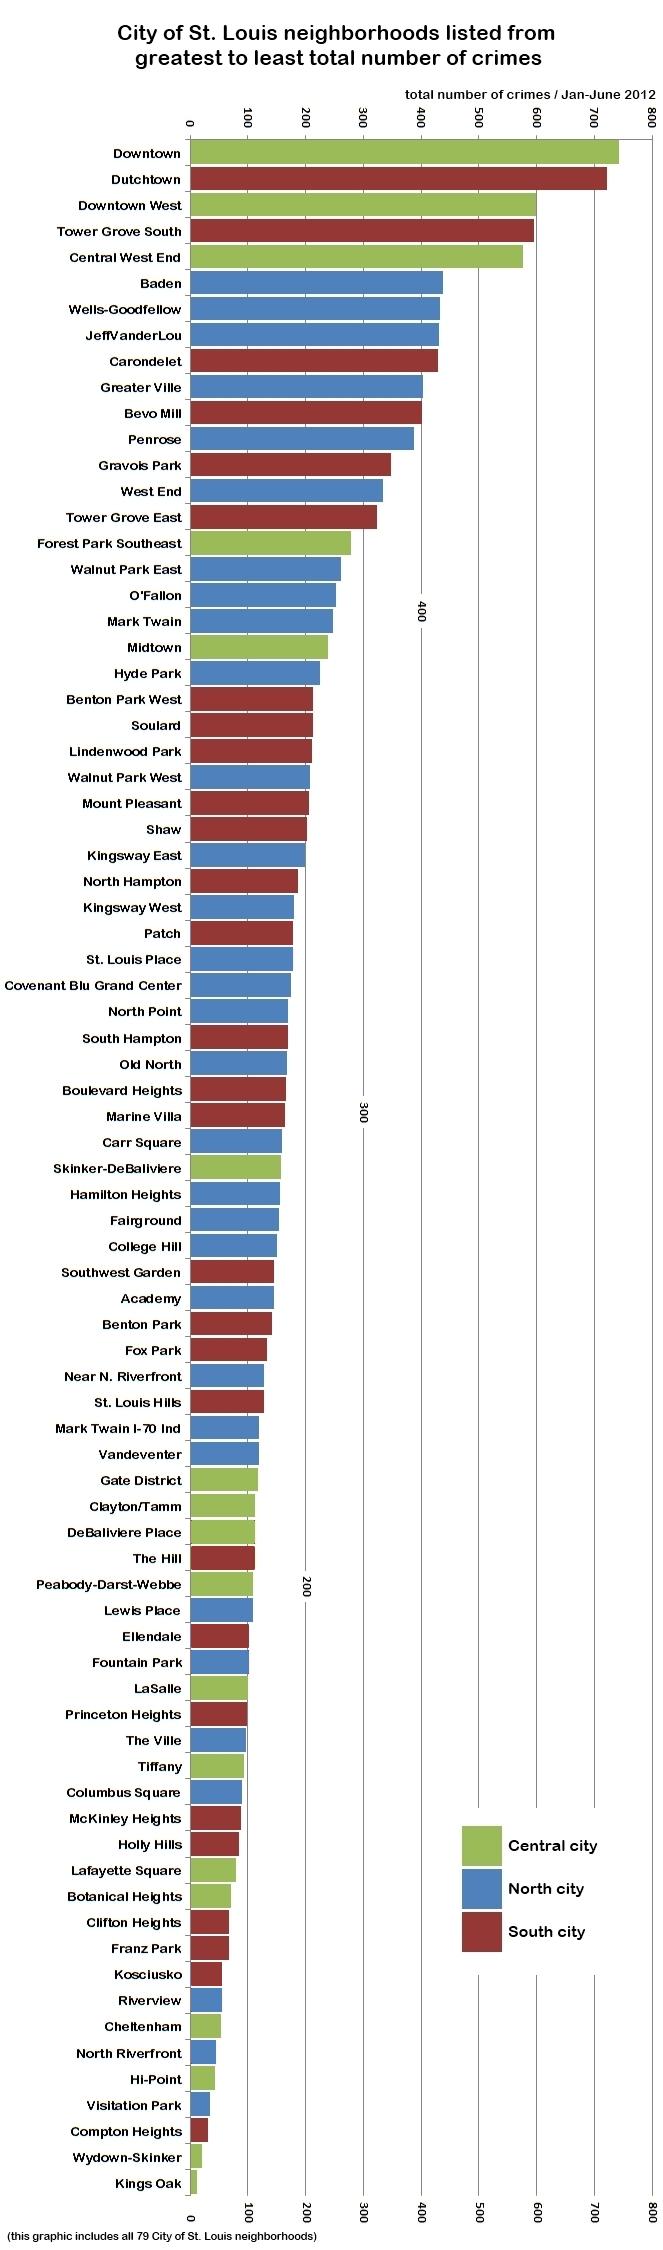 Understanding St. Louis: Total Crime Index and Crime-Ridden Neighborhoods